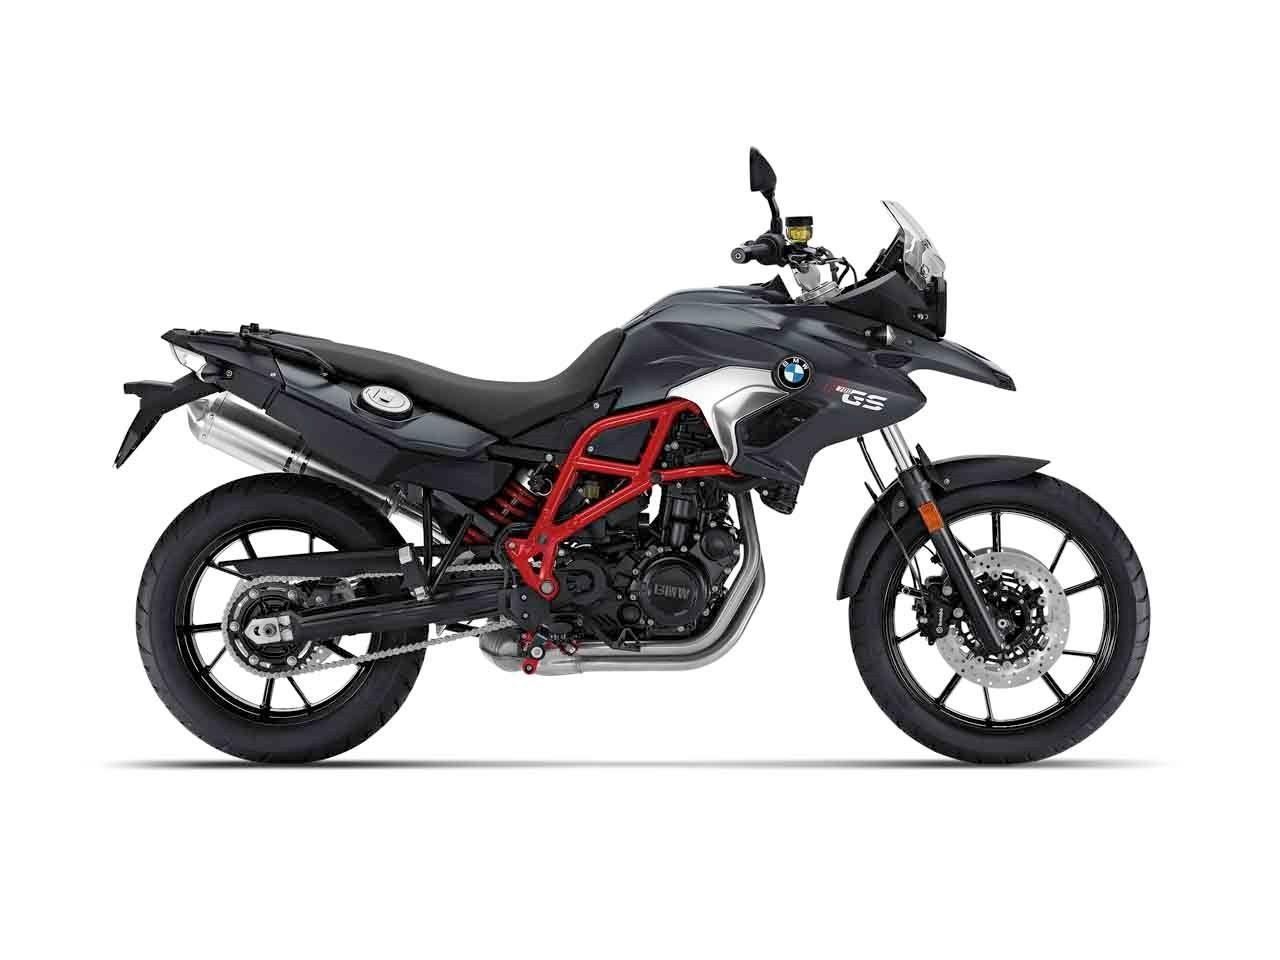 motorrad neufahrzeug kaufen bmw f 700 gs abs arrigoni sport gmbh adliswil. Black Bedroom Furniture Sets. Home Design Ideas